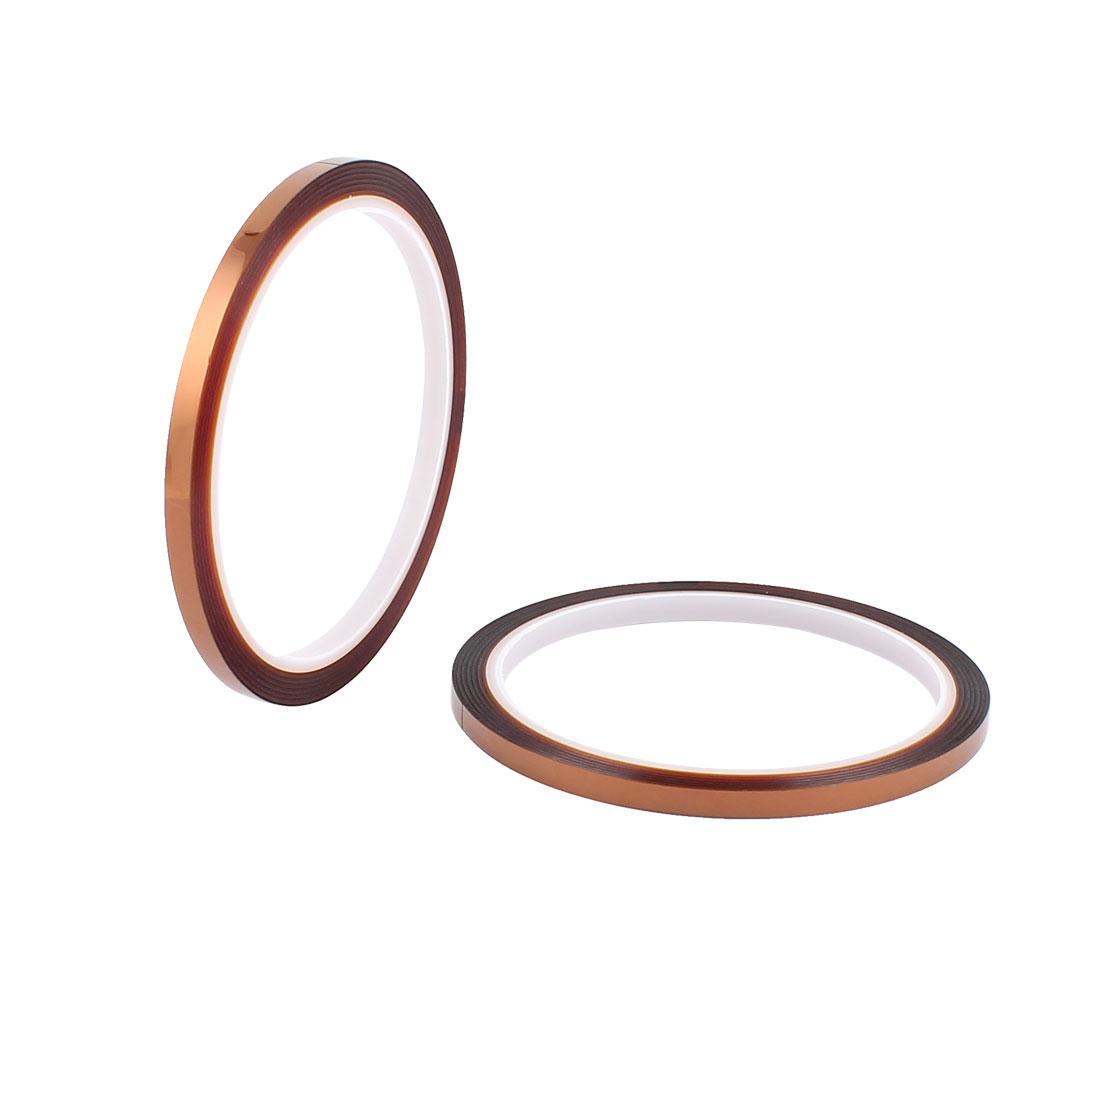 2 Pcs 0.5CM Width 33M Long DIY Tape High Temperature Resistant Polyimide